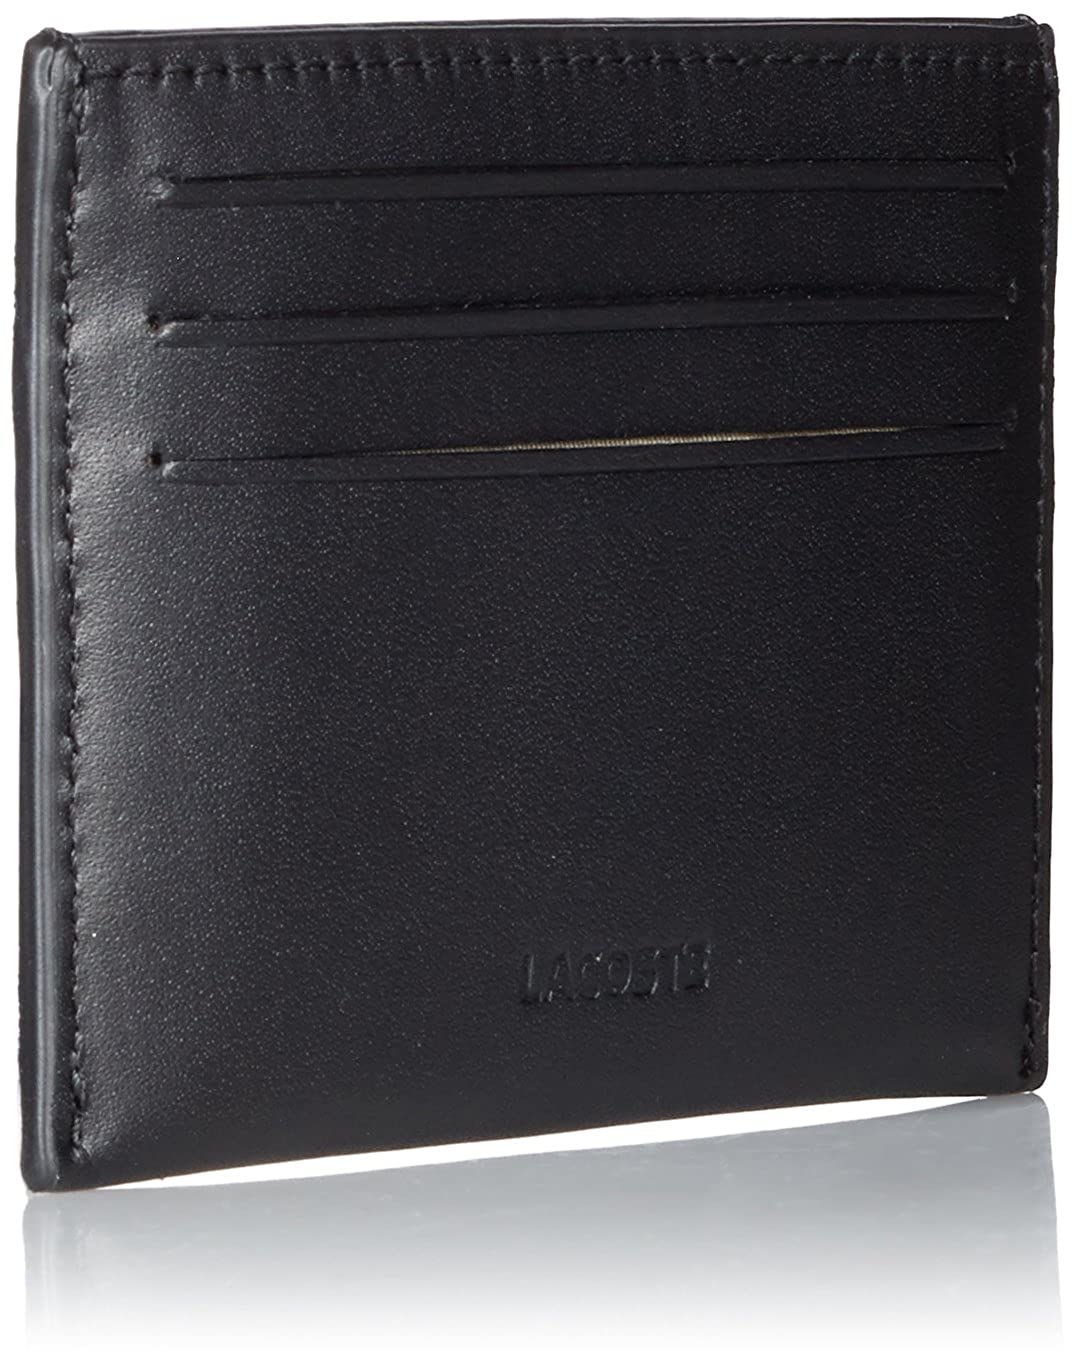 ff350cc4cf8b Lacoste Men s FG Credit Card Holder